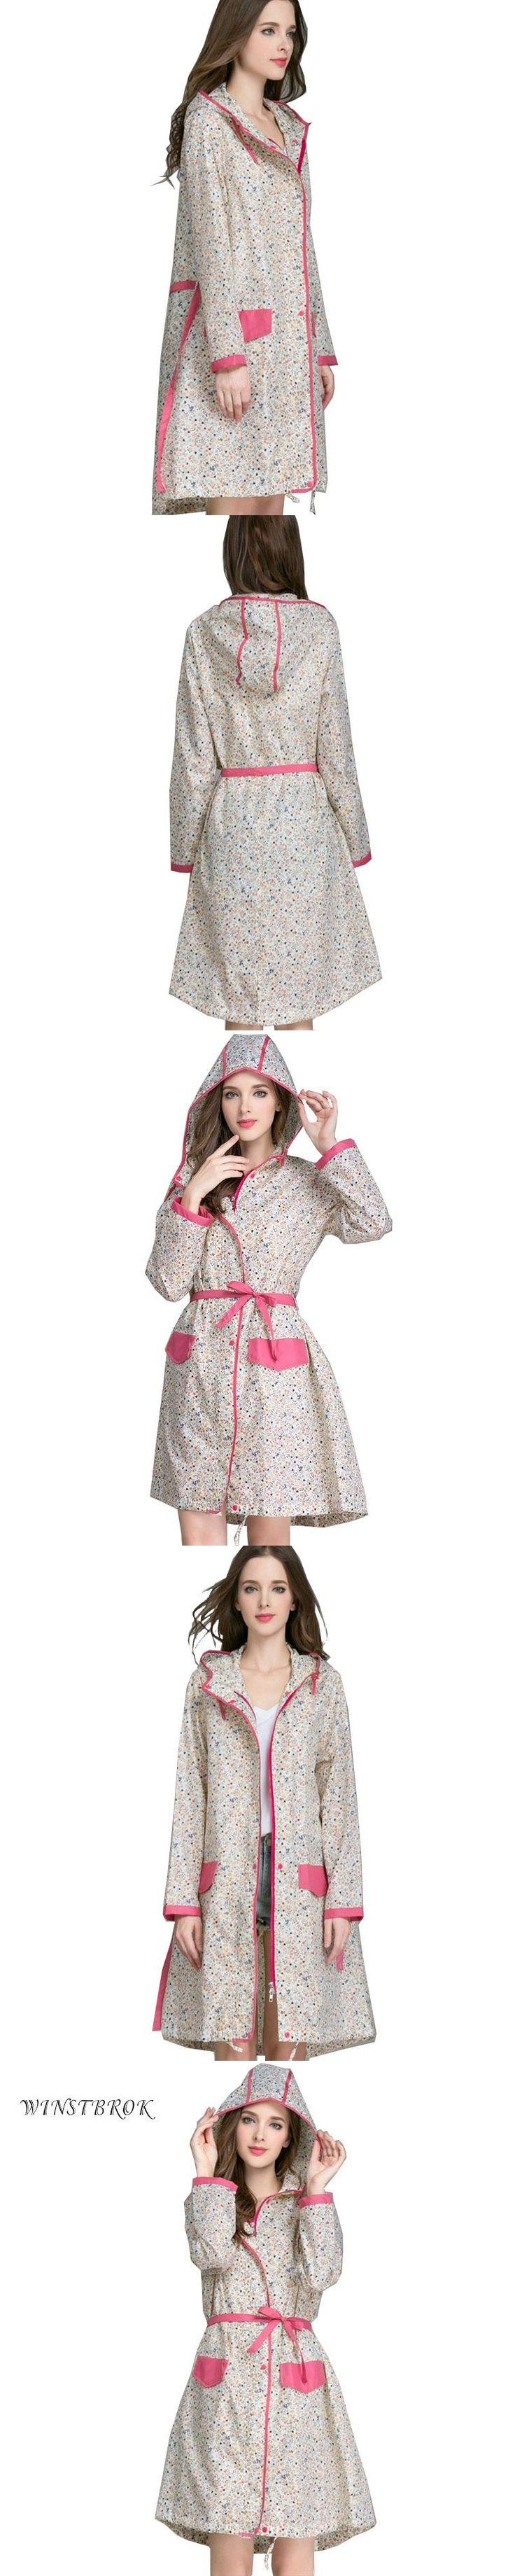 WINSTBROK Floral Long Raincoat Women Ladies Rain Coat Women's Rainwear Breathable Outdoor Travel Water-Repellent  Riding Clothes